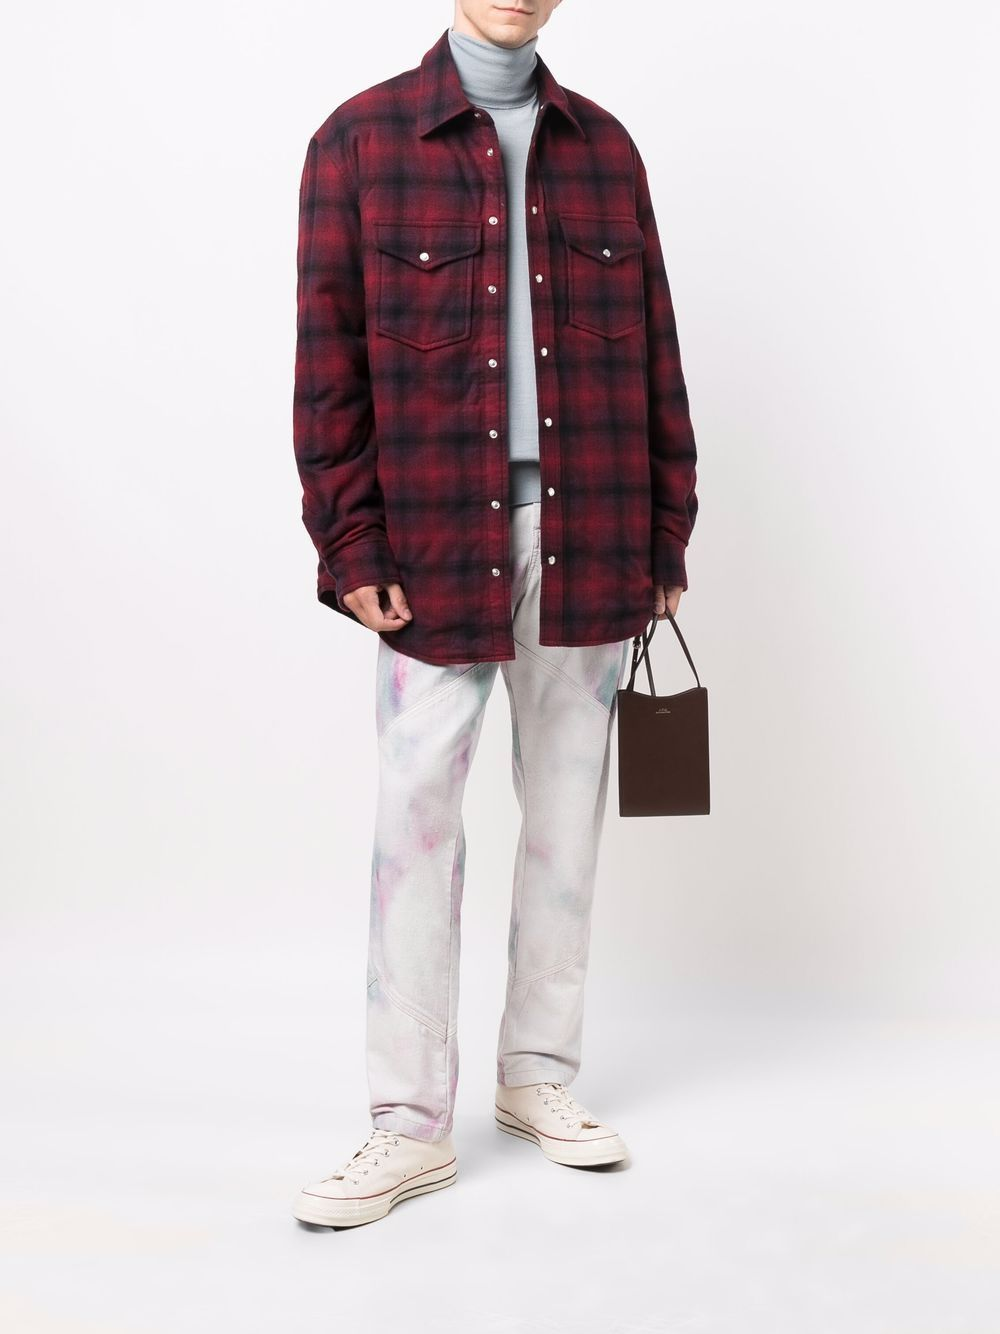 giacca ruddy uomo a quadri in lana ISABEL MARANT   Giacche   21AVE1619-21A026H70RD